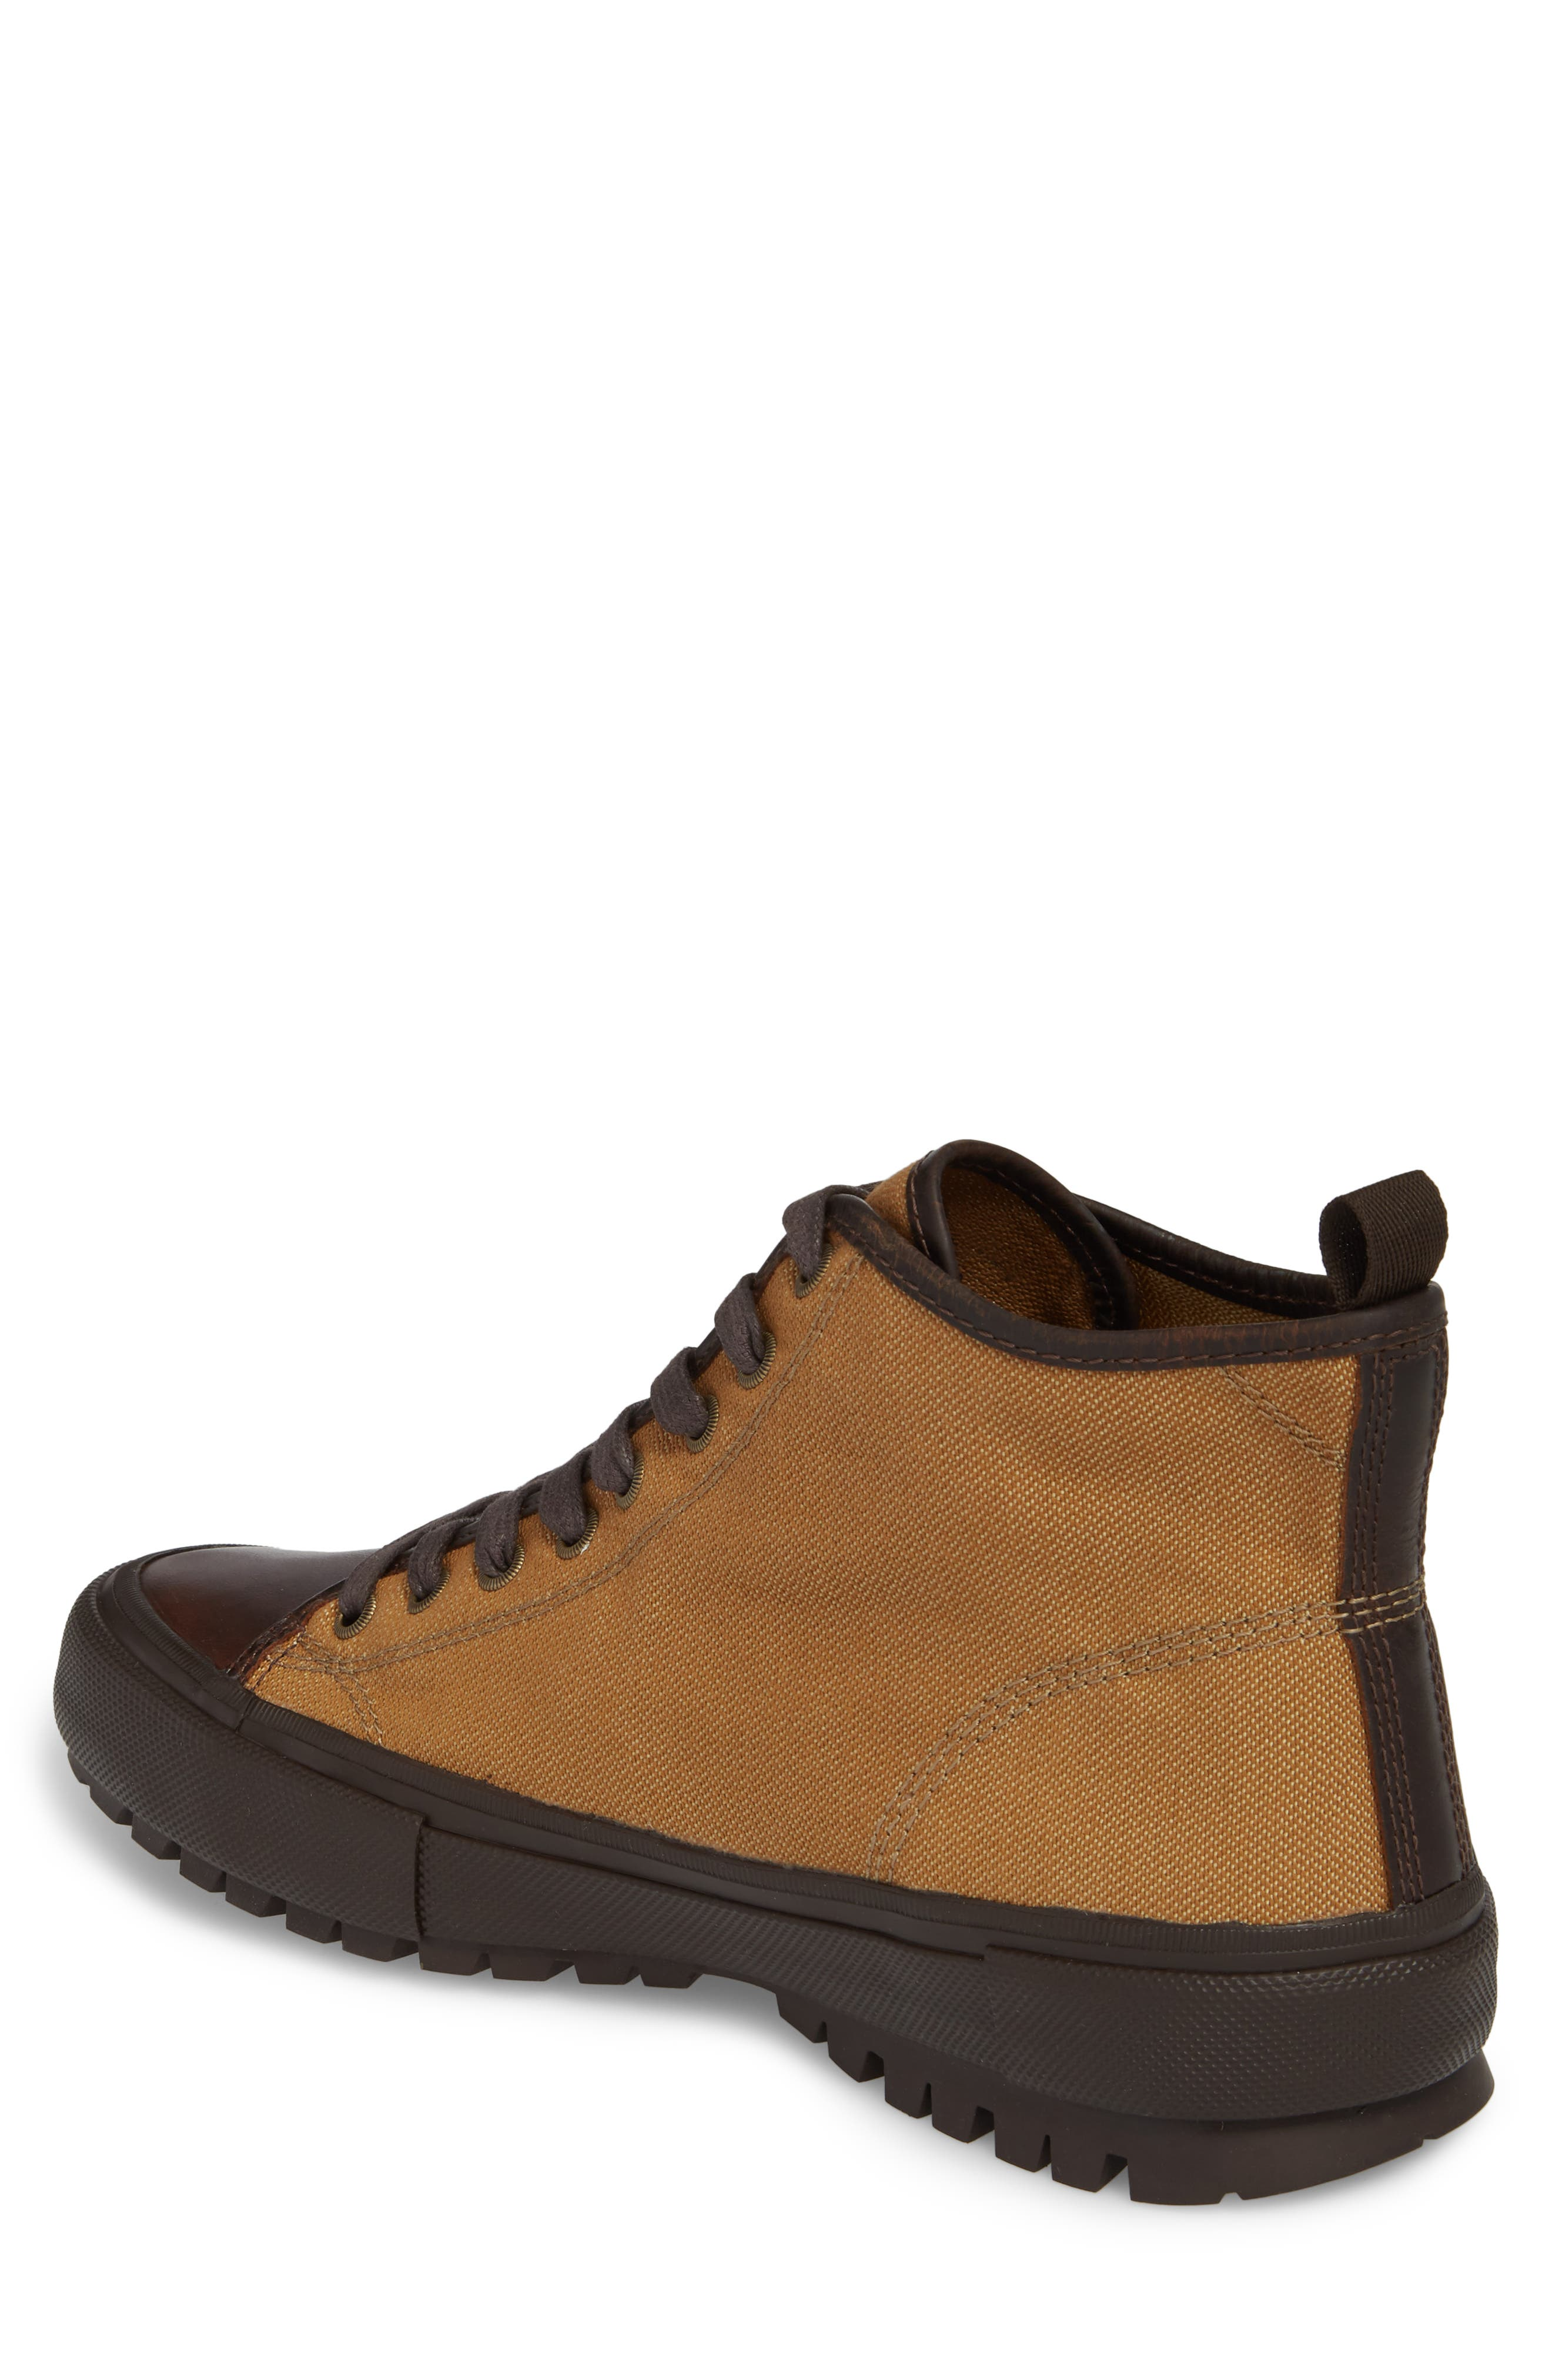 Ryan Lugged Sneaker Boot,                             Alternate thumbnail 2, color,                             Tan Canvas